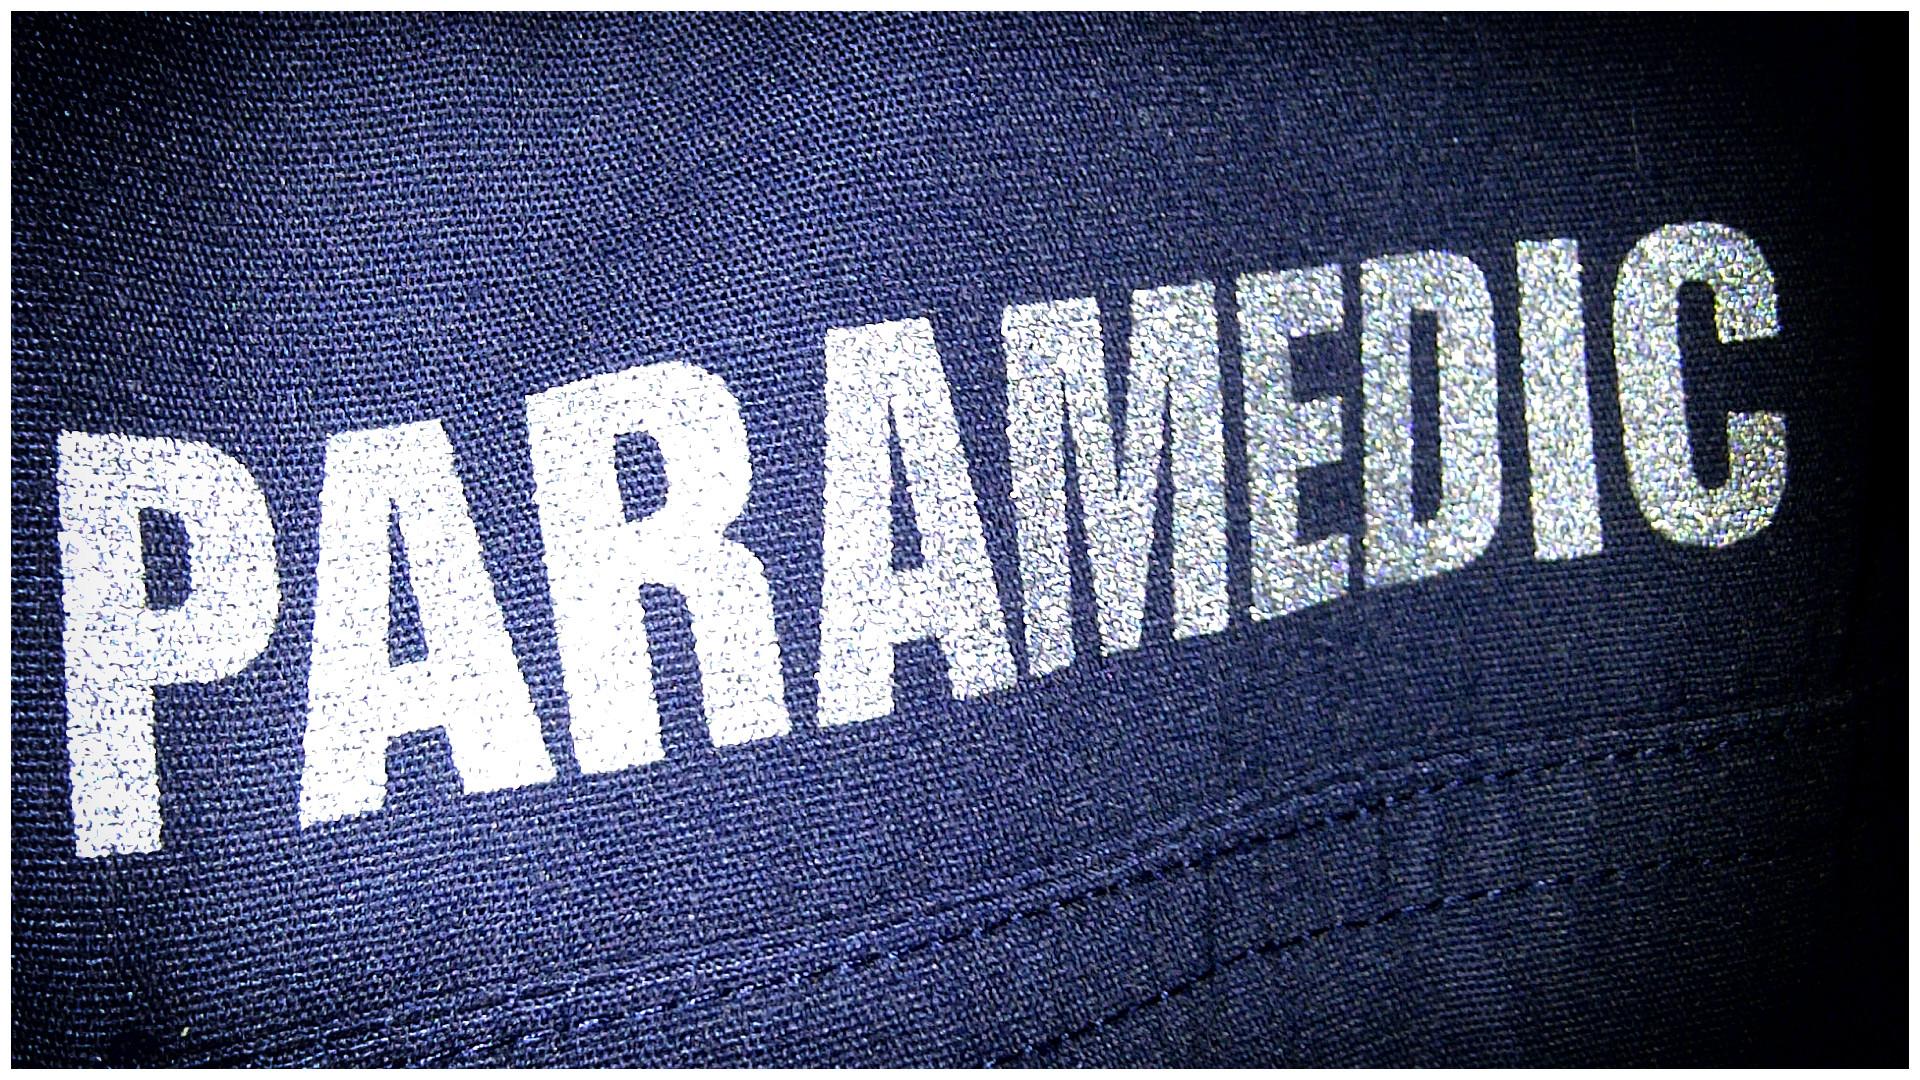 Ombudsman Investigates Toronto Paramedics' Handling Of PTSD